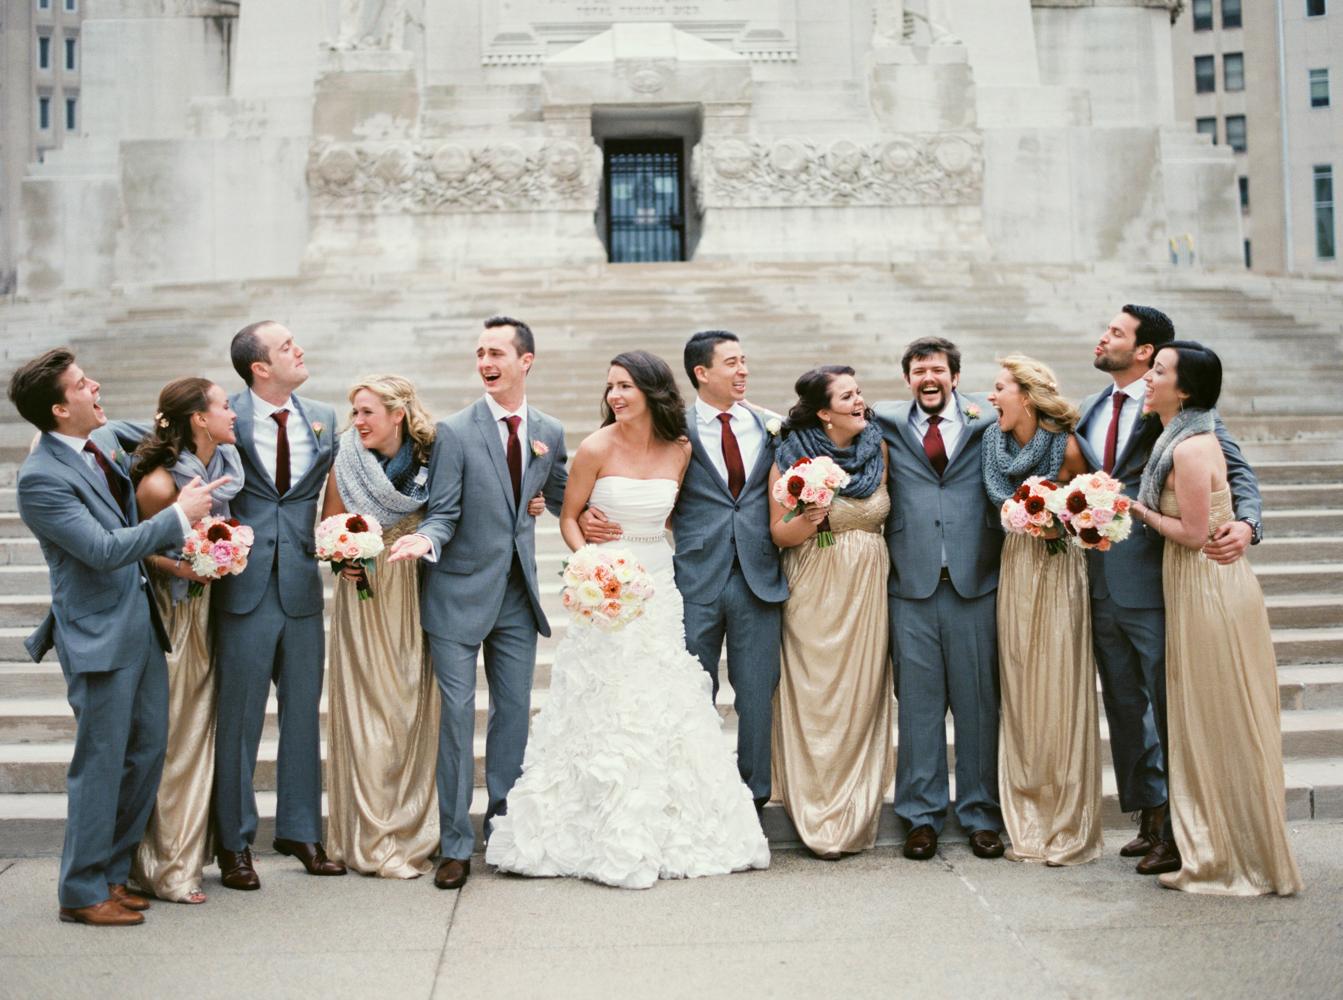 Golden Colour Wedding Gowns: Elizabeth Anne Designs: The